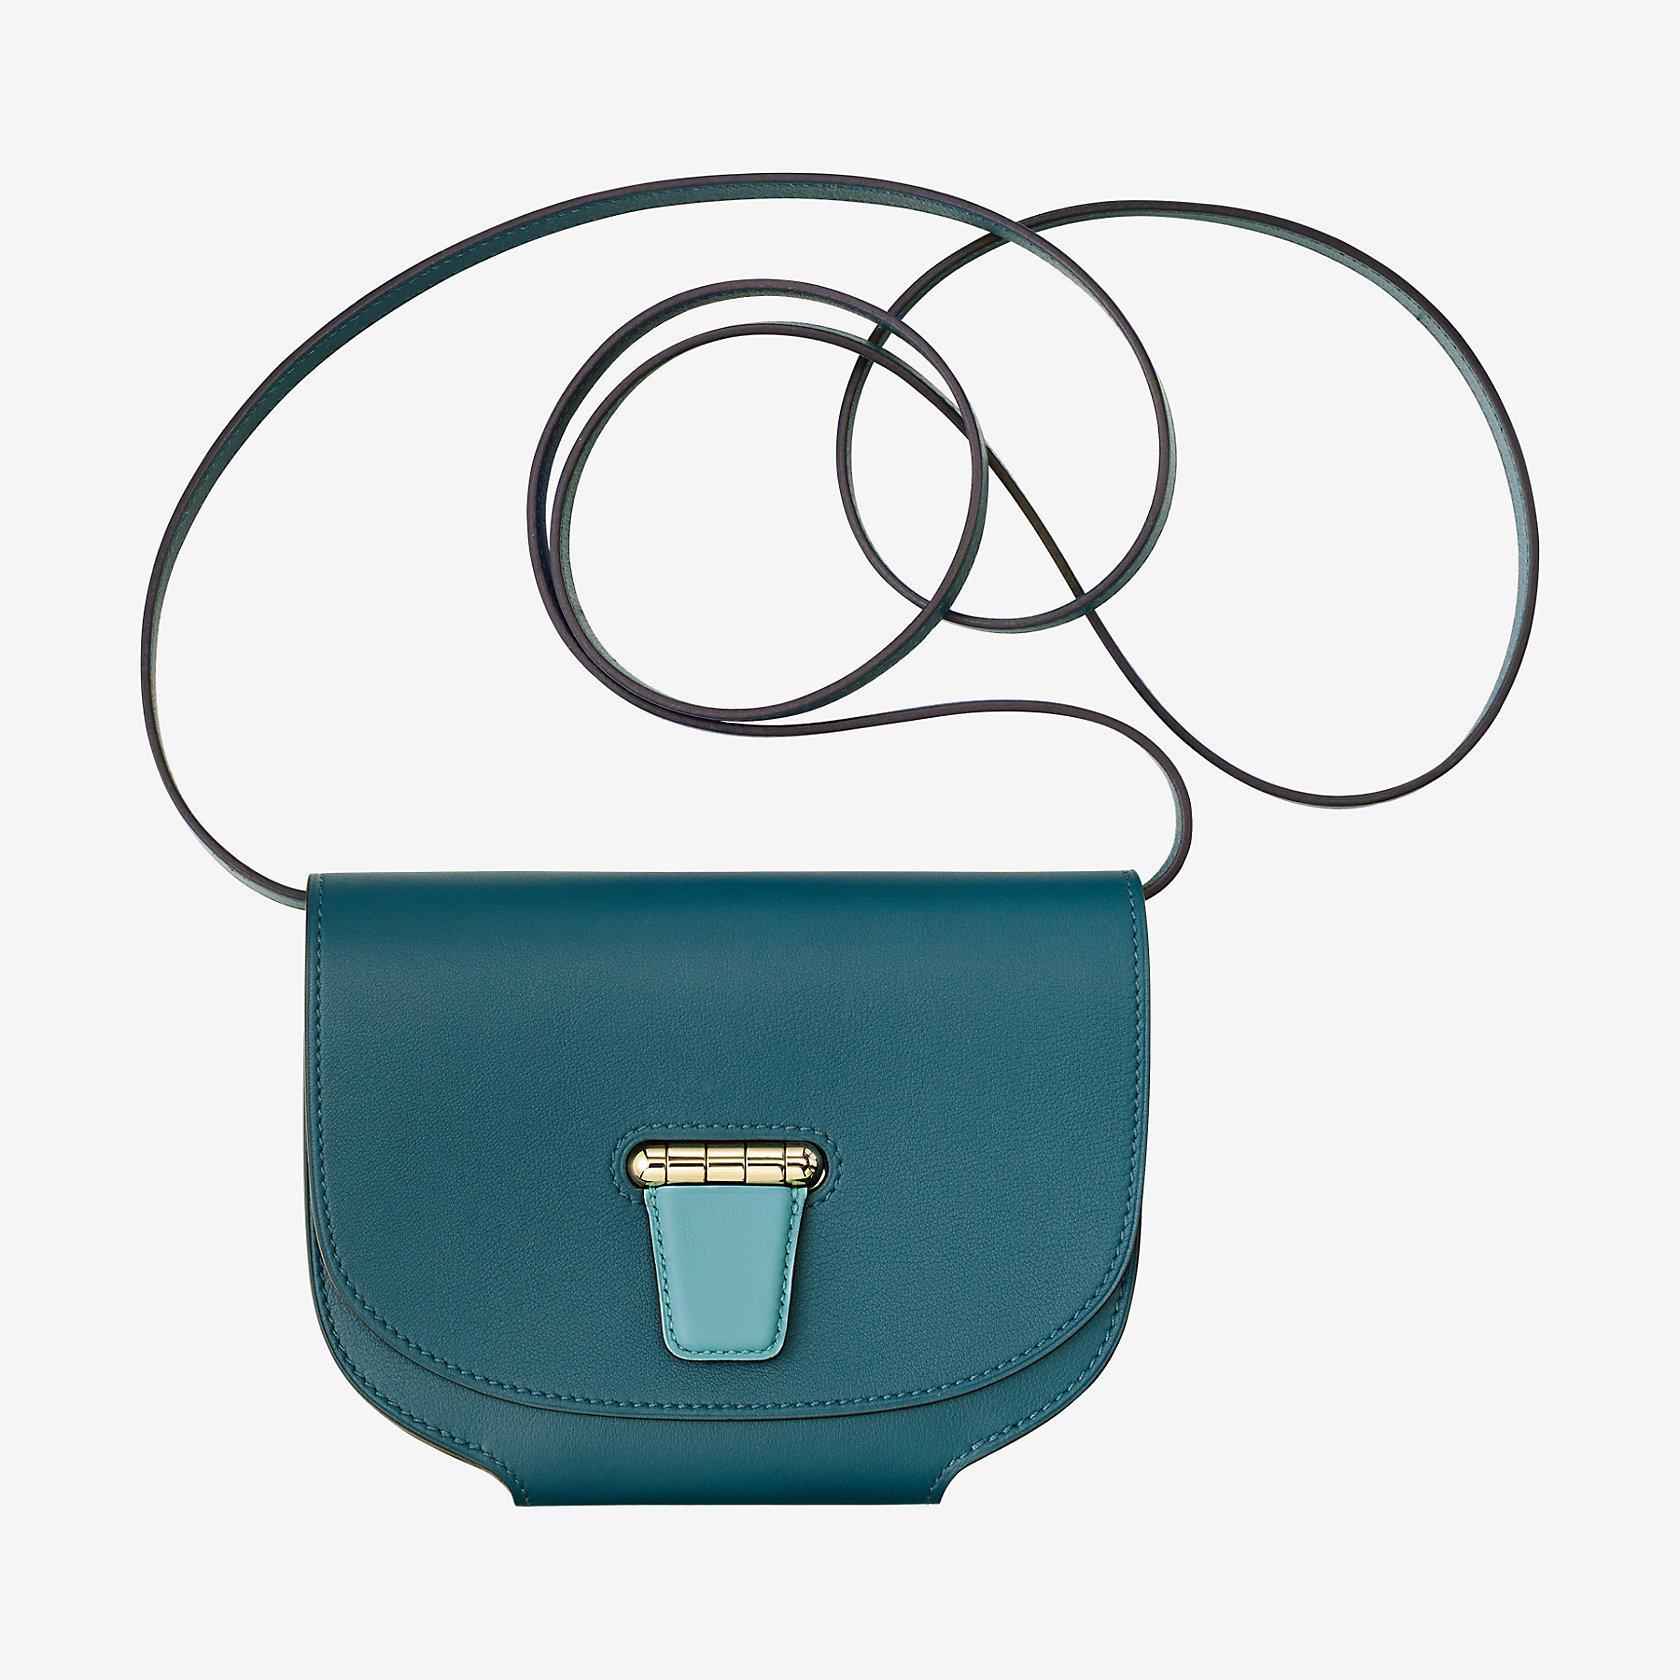 portefeuille mini convoyeur mini mod le herm s. Black Bedroom Furniture Sets. Home Design Ideas